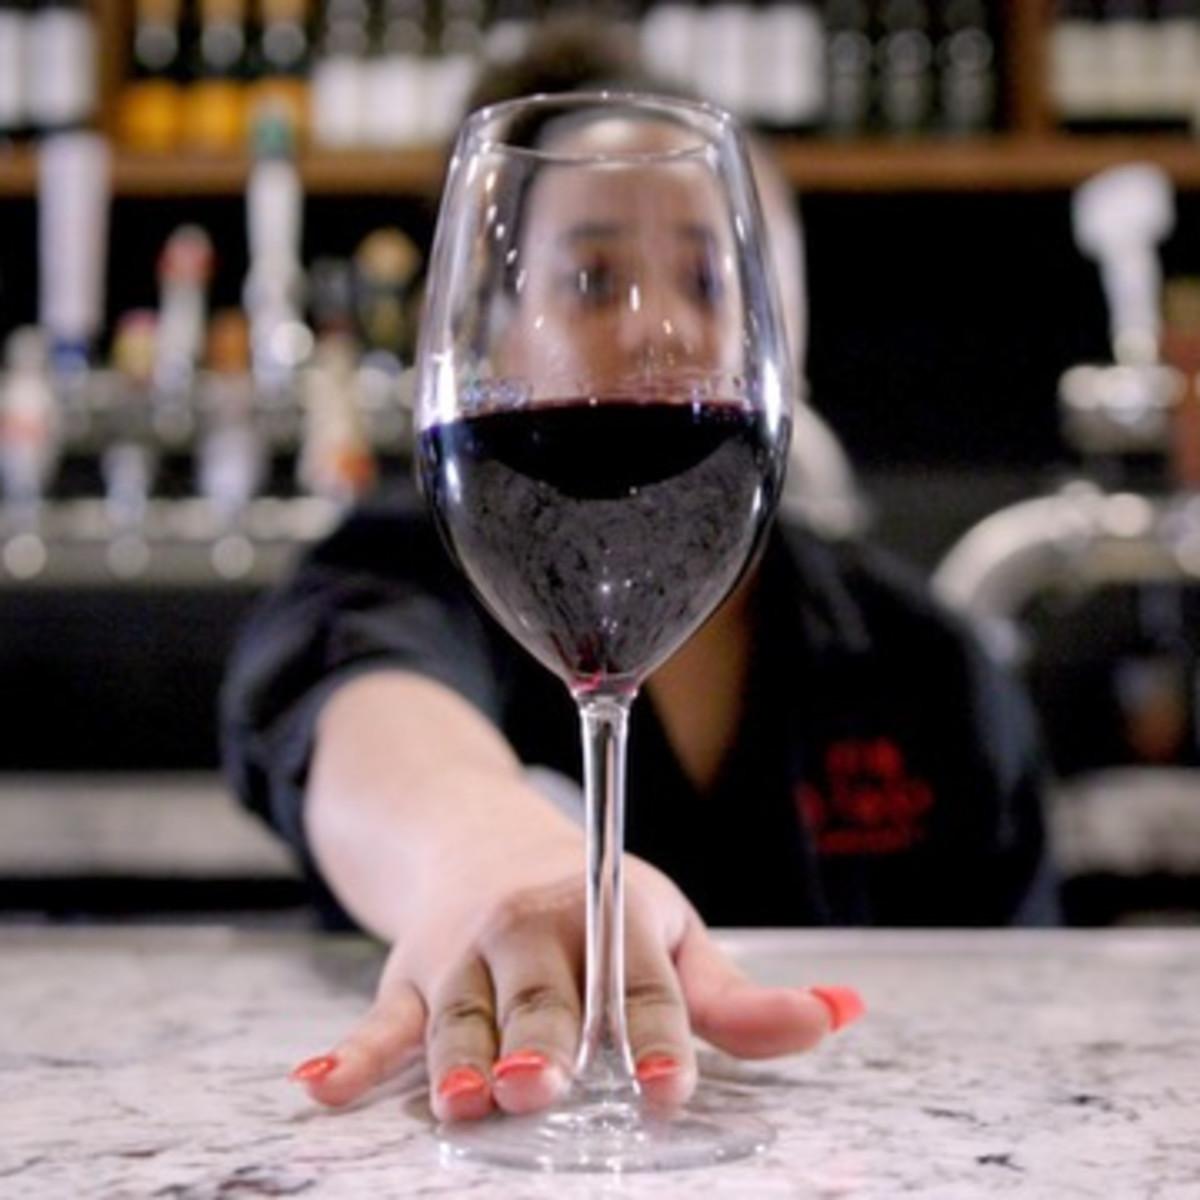 Bartender serving glass of wine